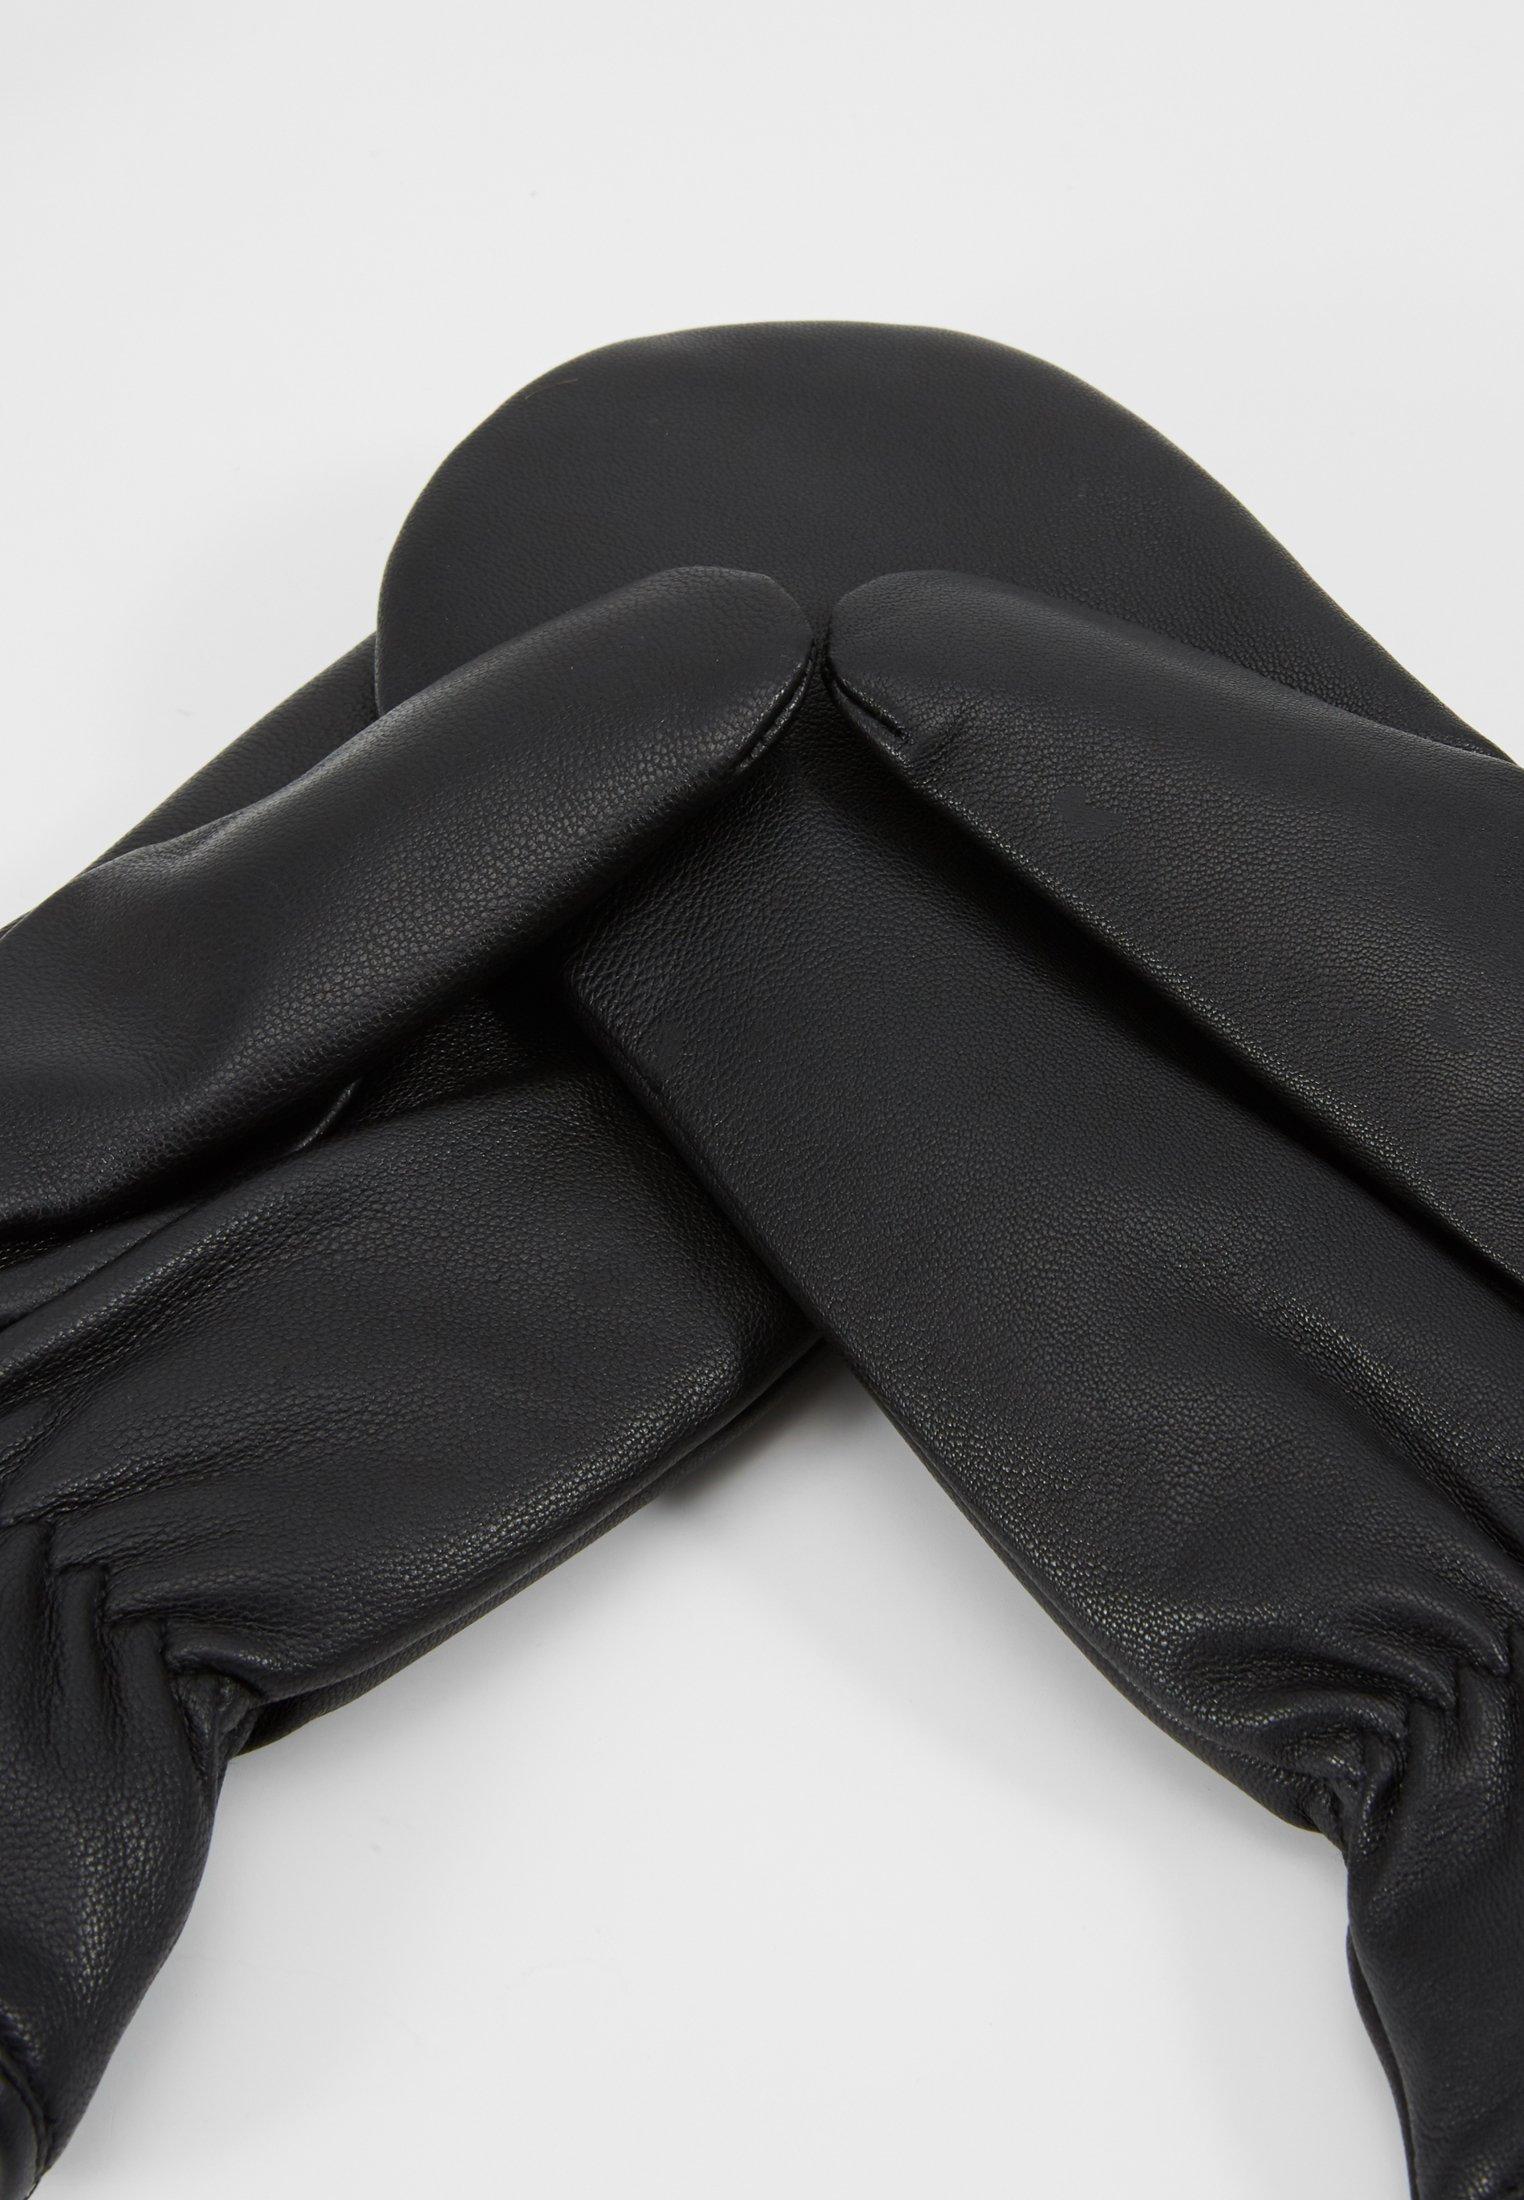 Pieces Votter - black/svart kpnLZ4I7wnFlTyC